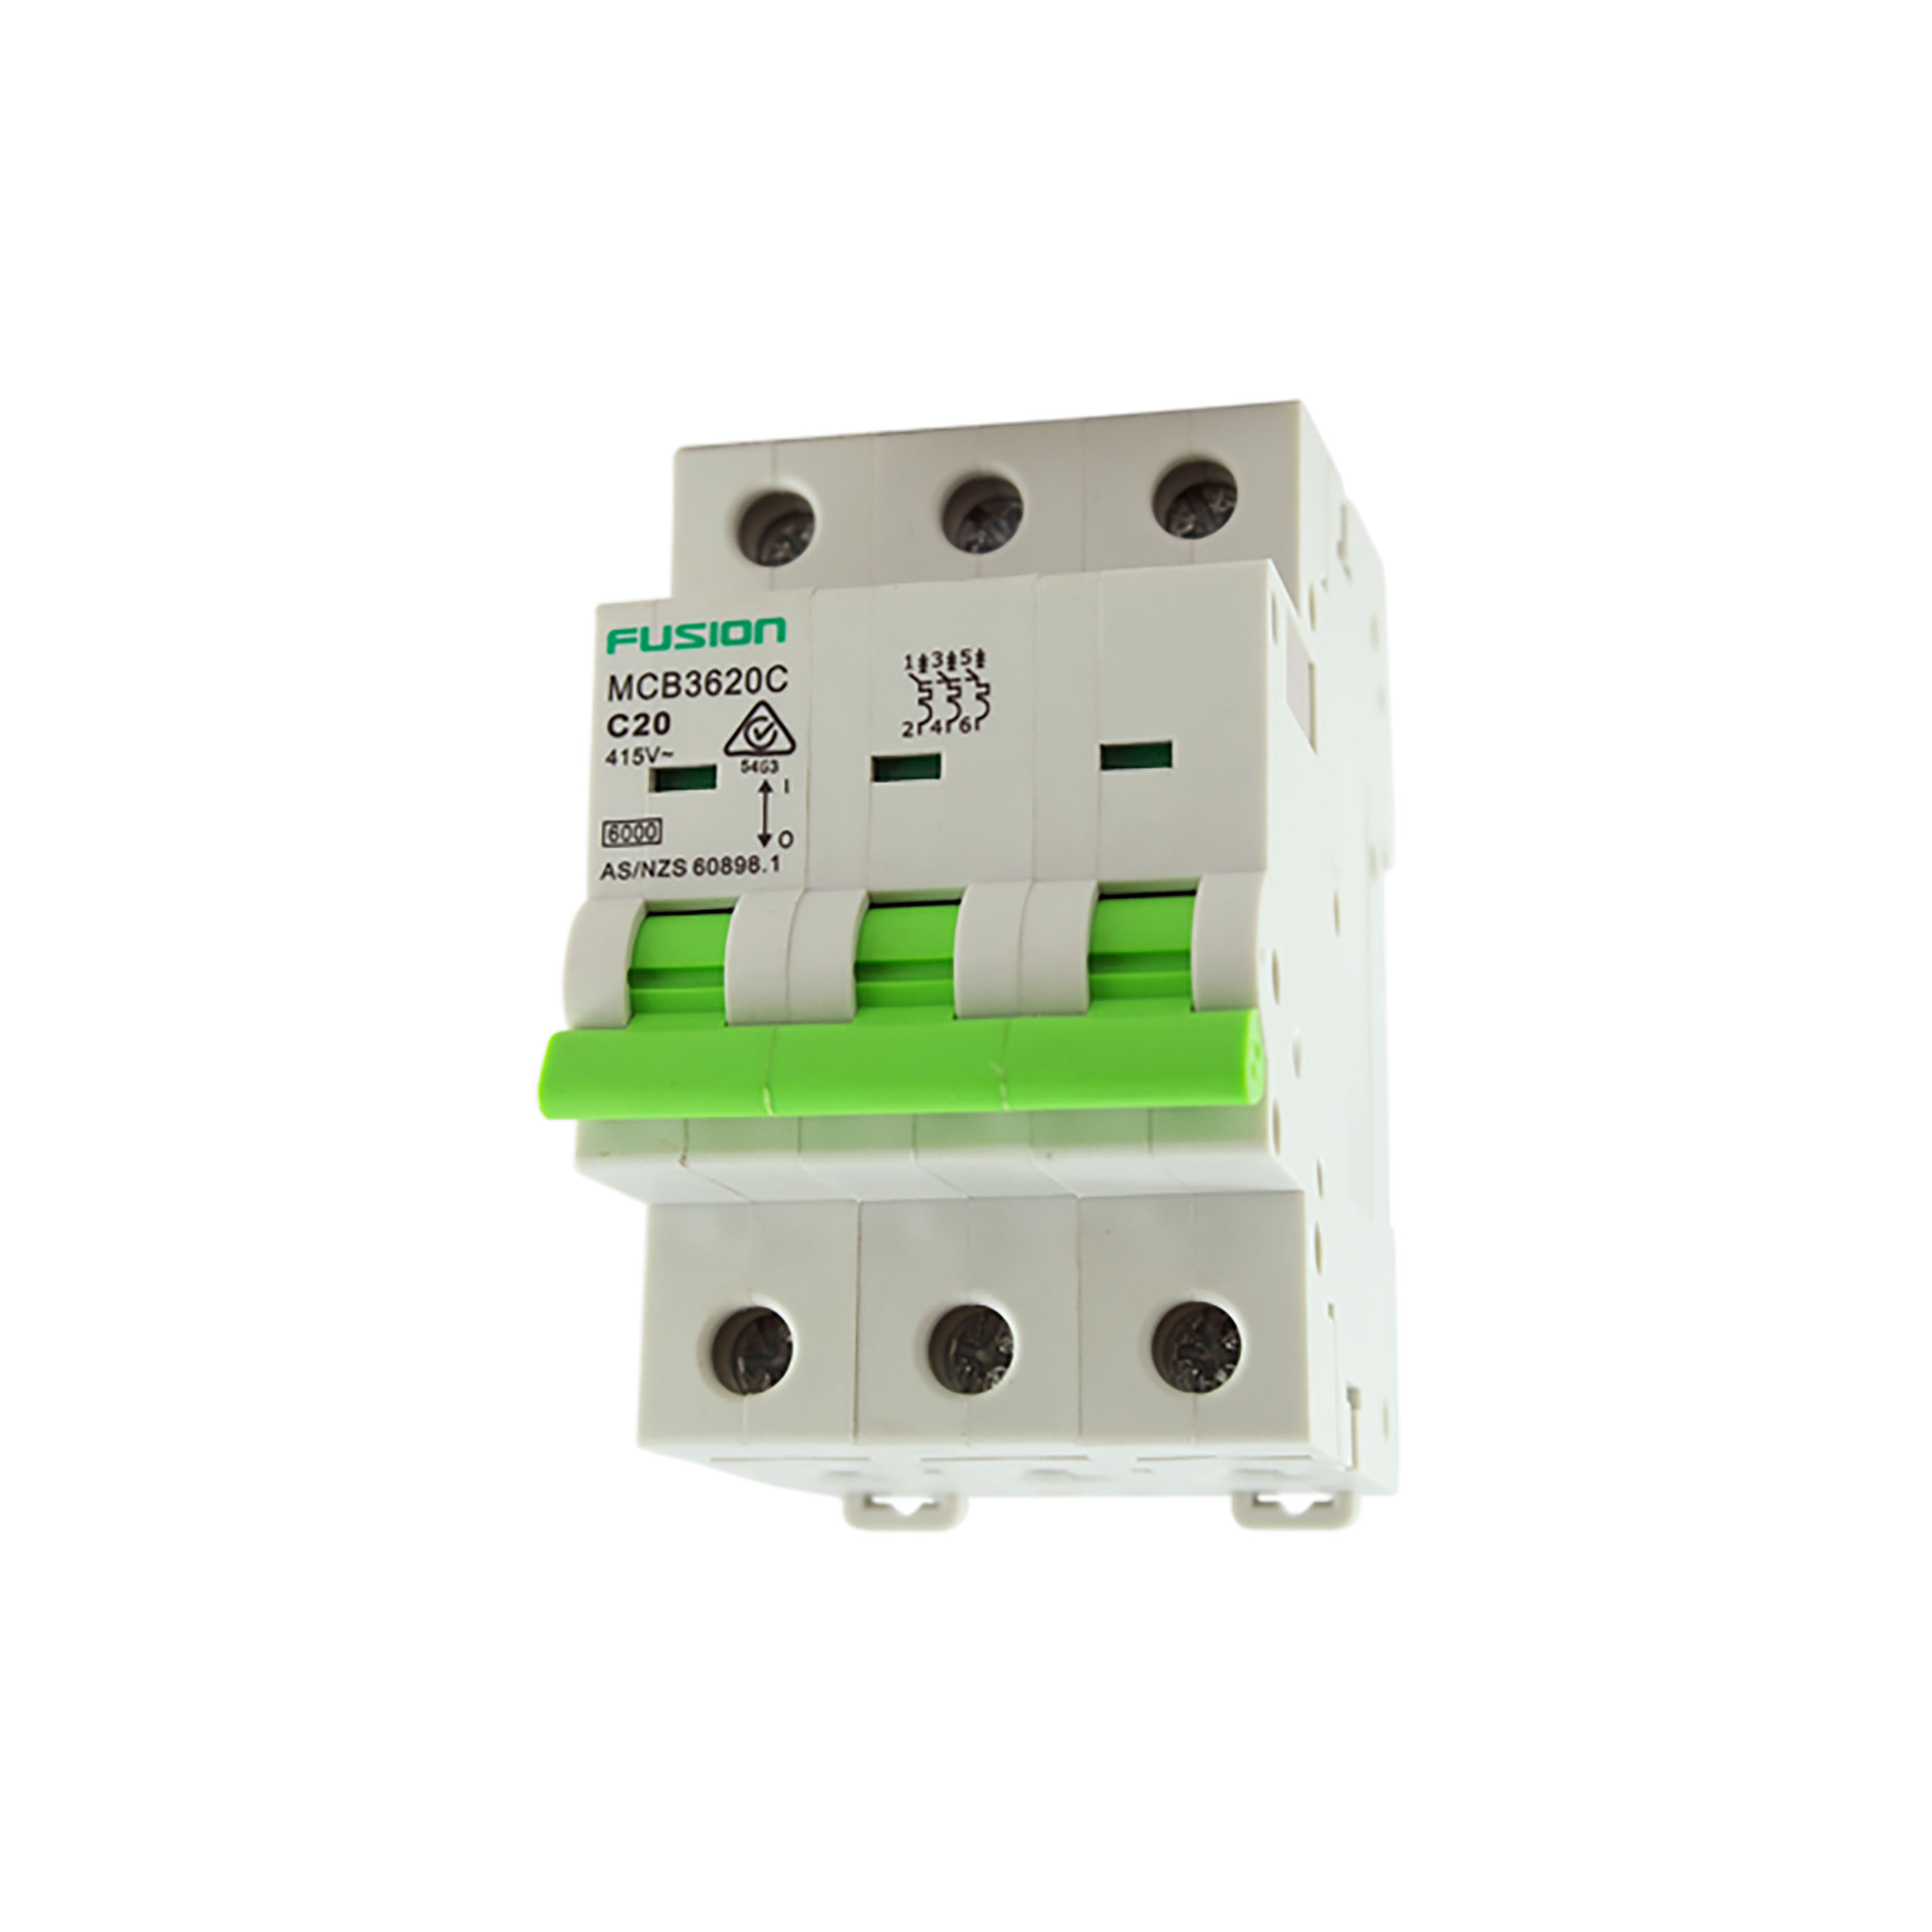 10A 3 Pole Circuit Breaker 6kA C Curve mcb3610c